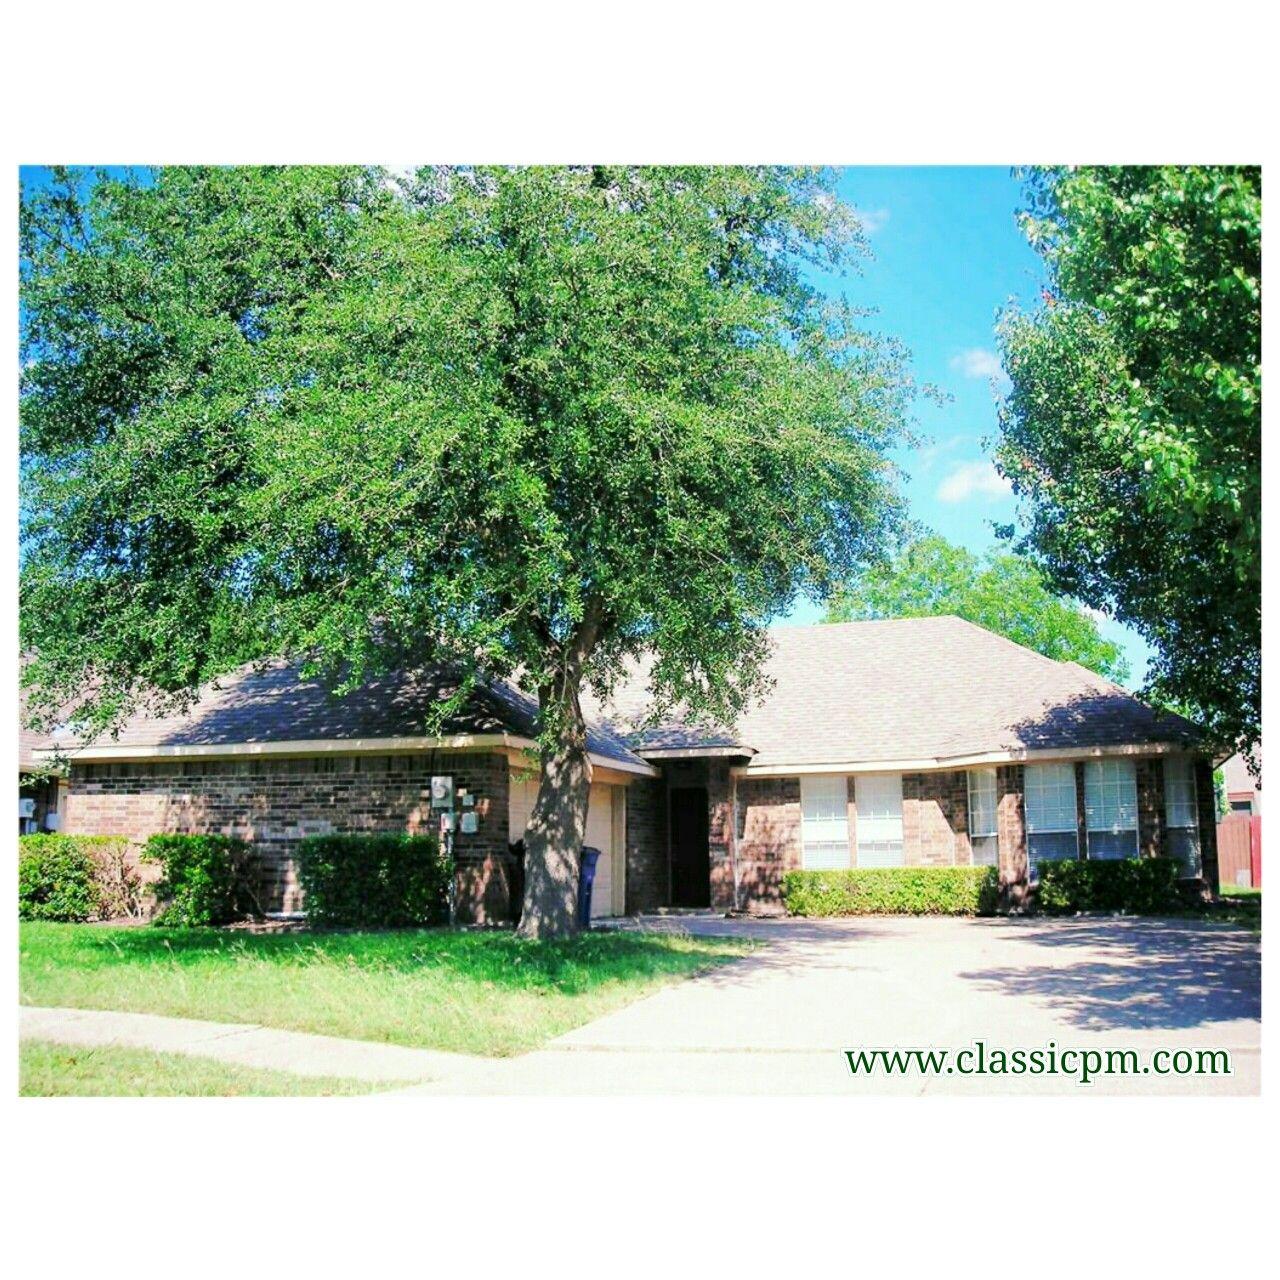 1628 Riverway Bend Circle Dallas, Texas 75217 134,900